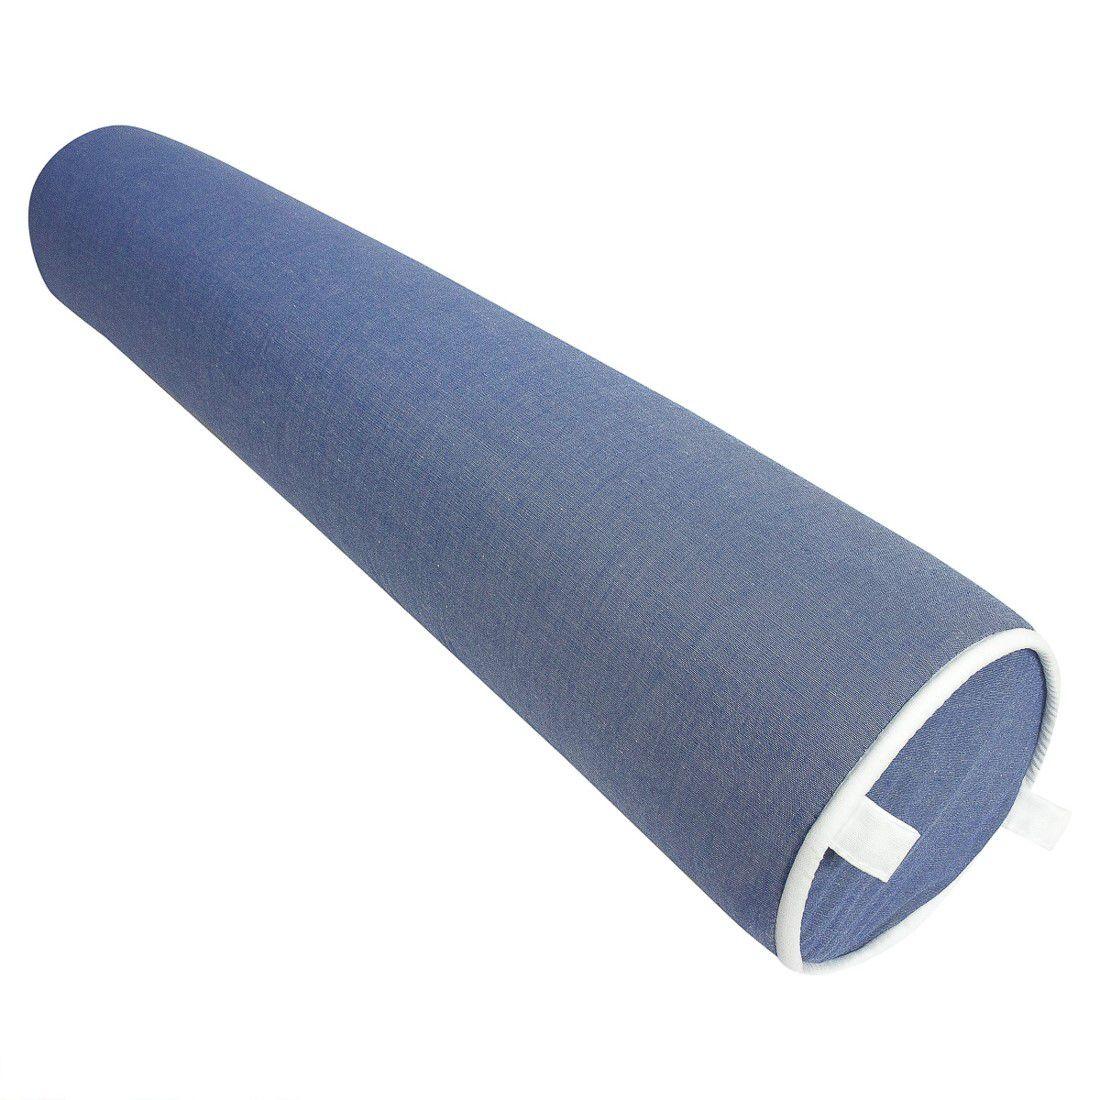 Rolo 60cm azul jeans